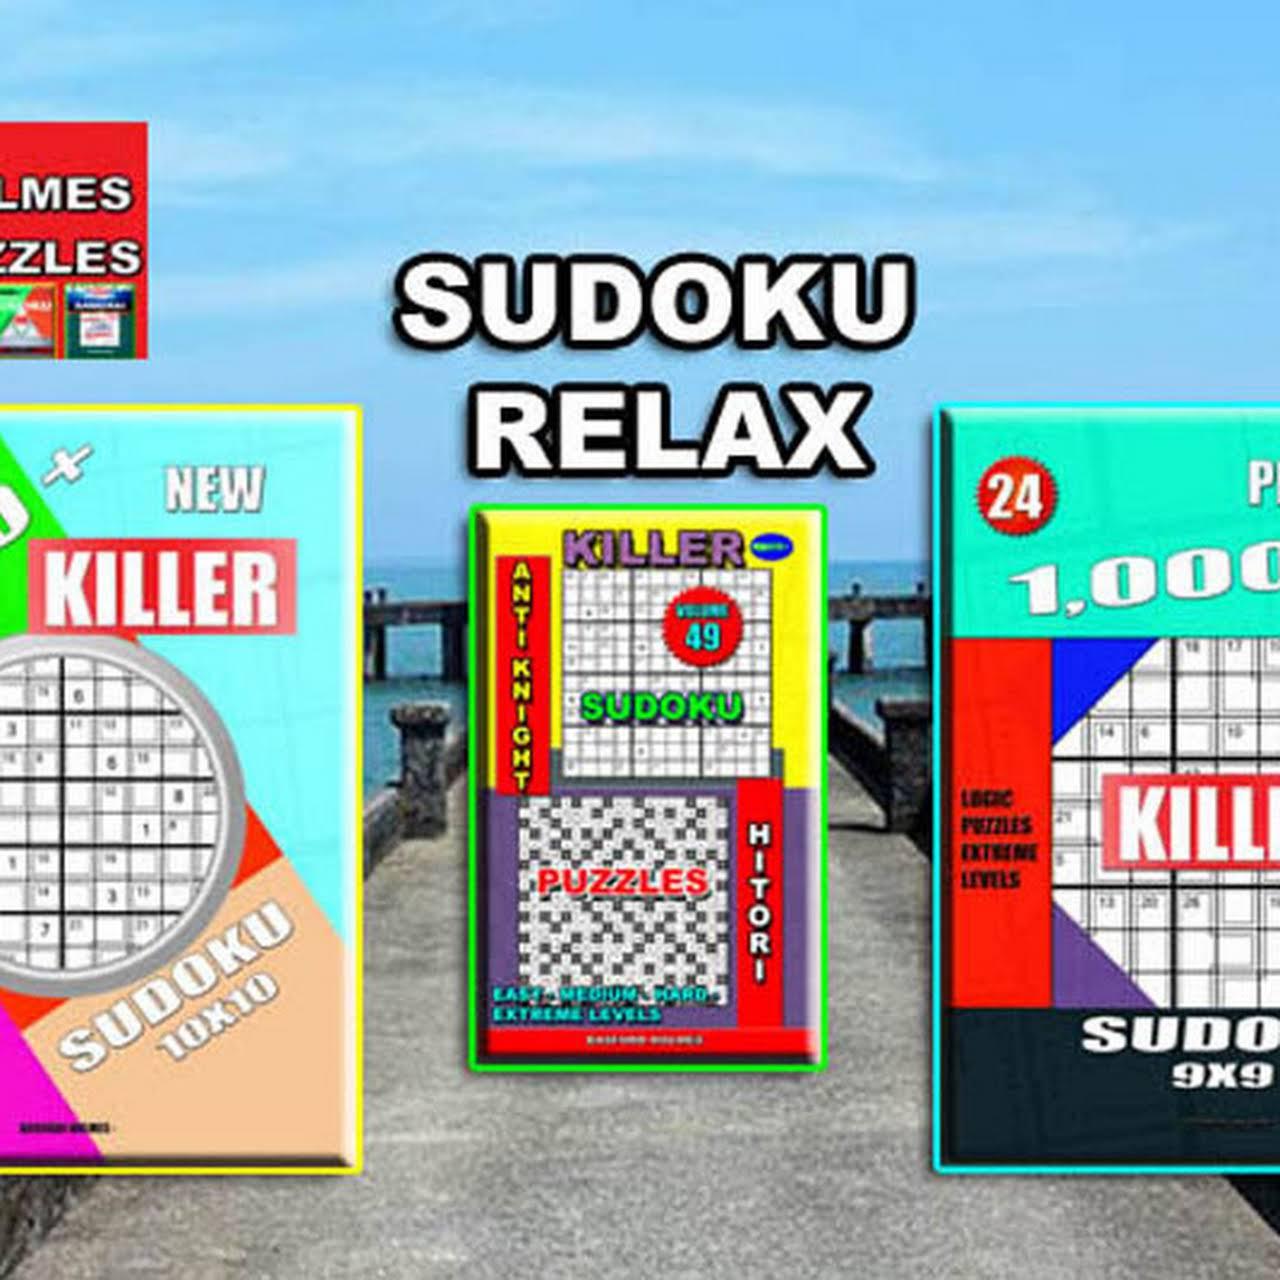 Sudoku - Puzzles books